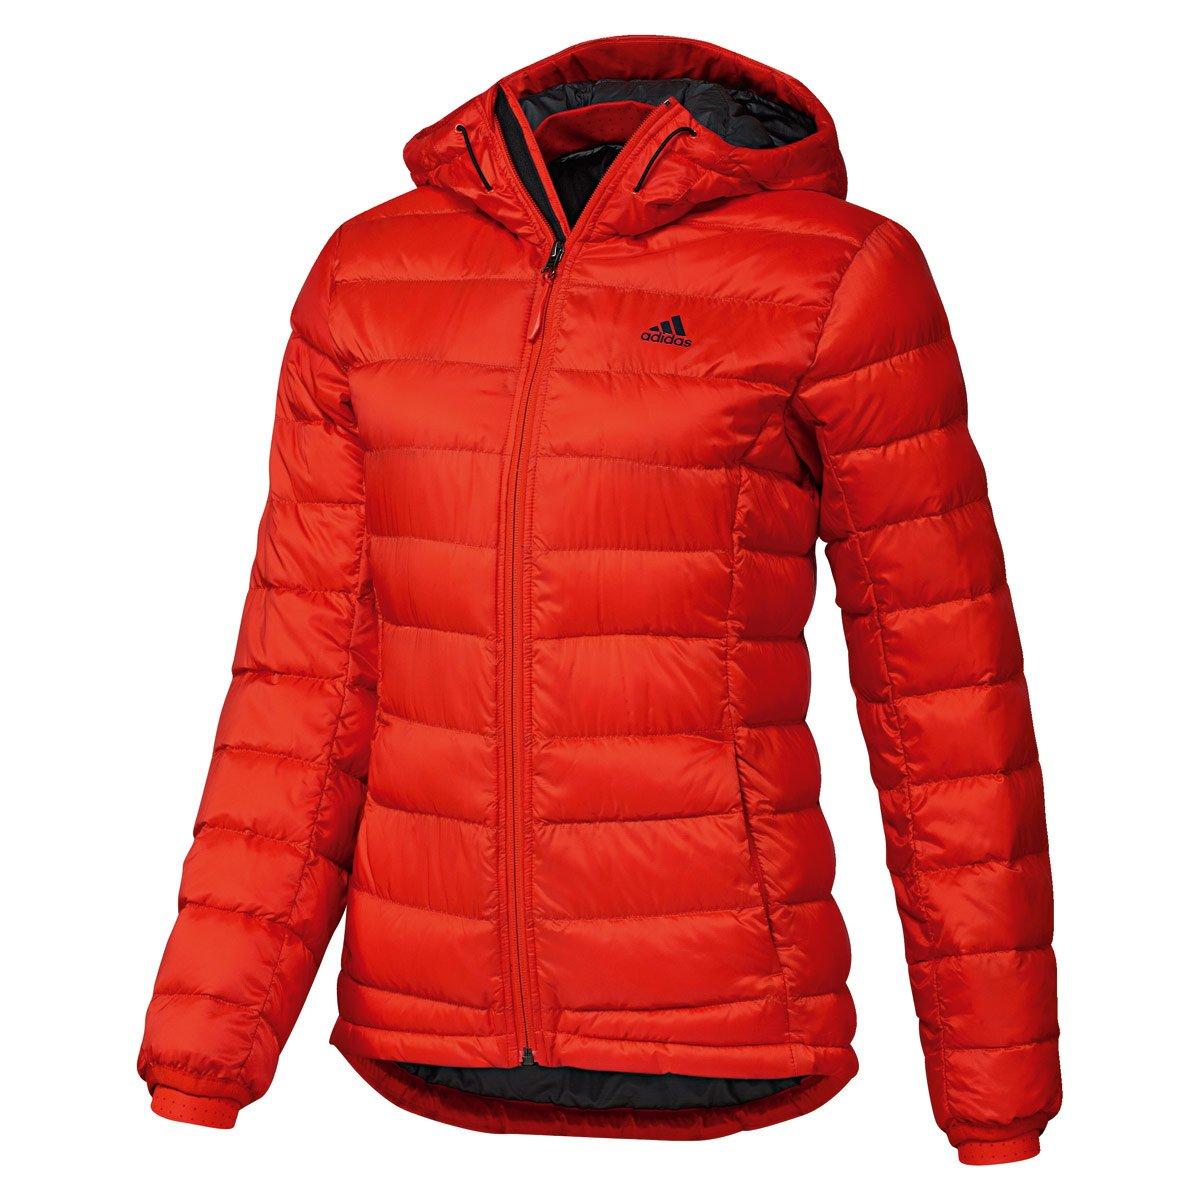 adidas Damen Daunenjacke Climaheat Frostlight Jacket online kaufen